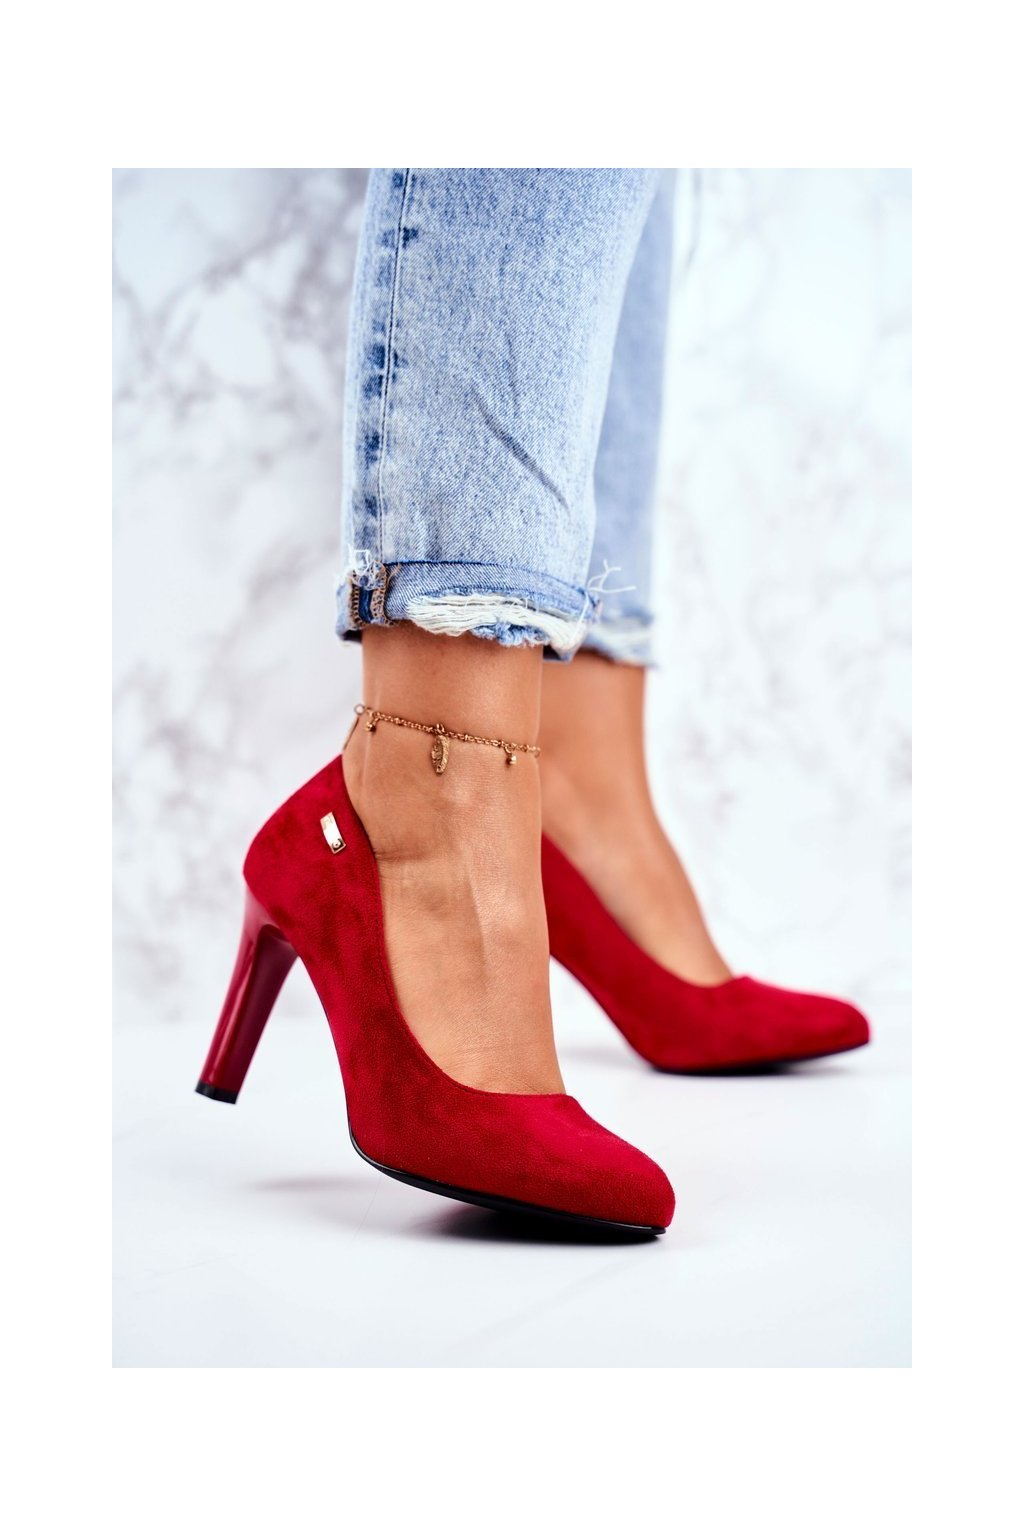 Dámske lodičky farba červená kód obuvi 1457 C.CZERWONY MIC